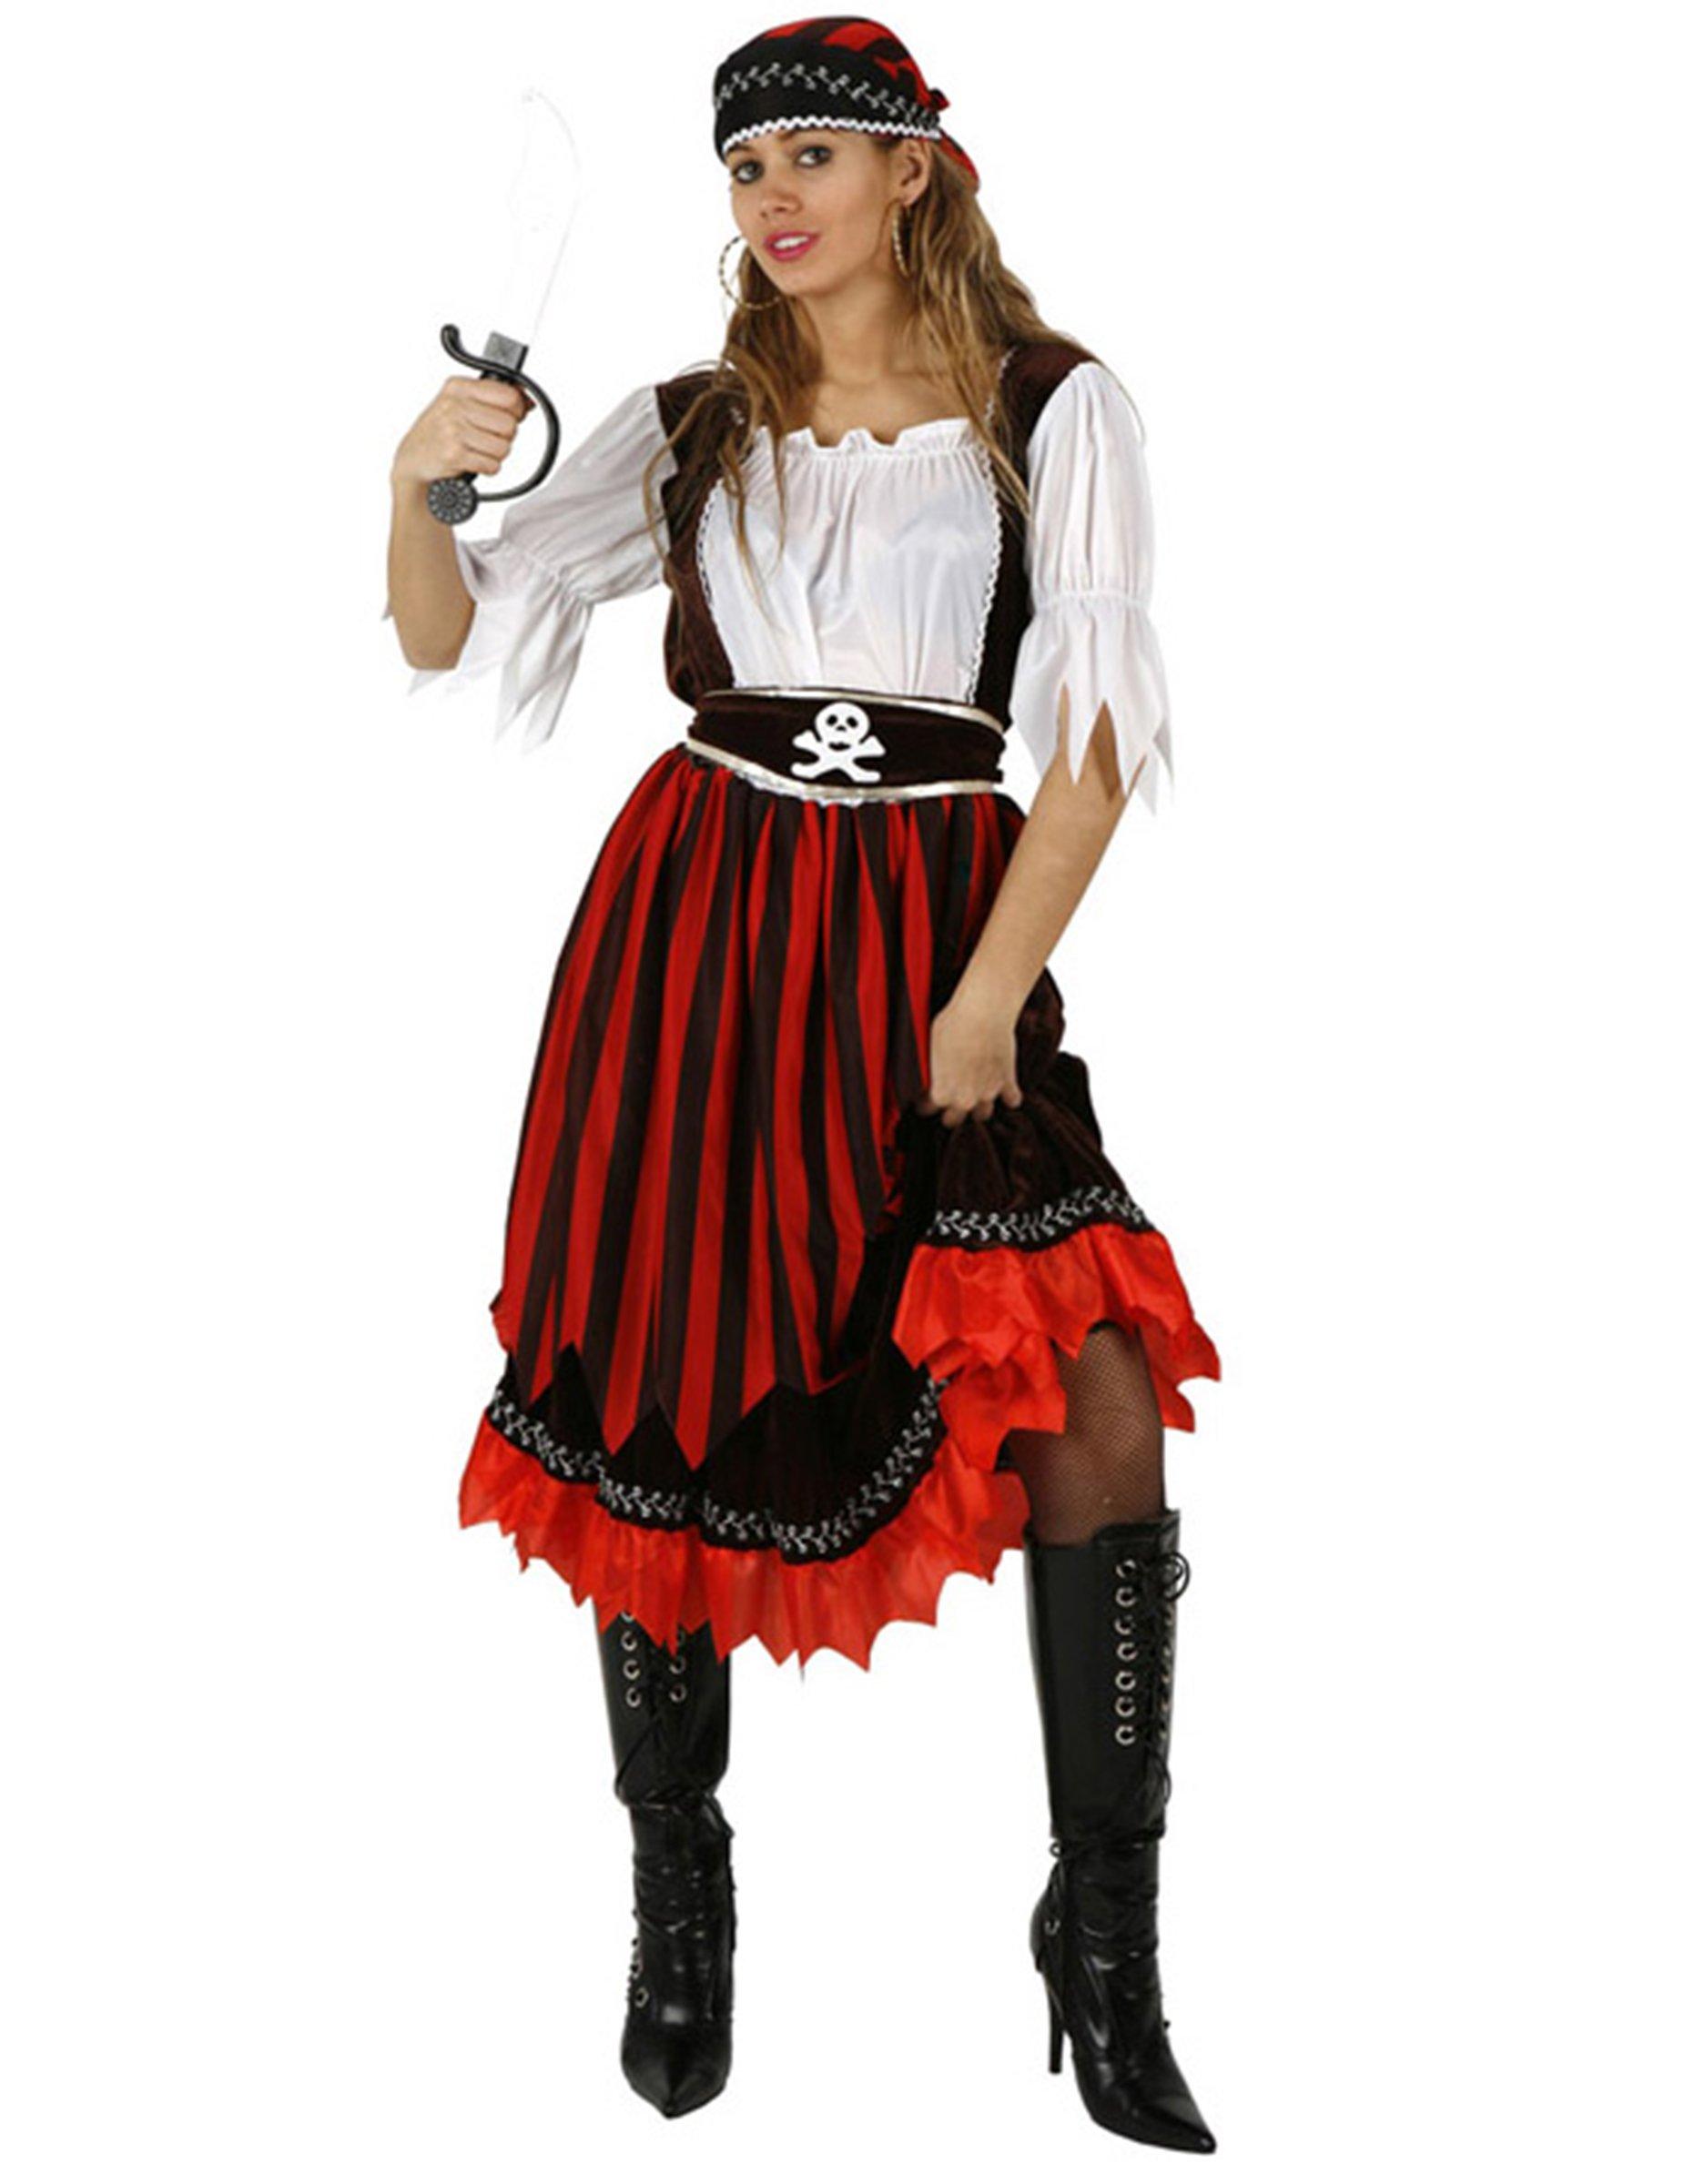 verruchte piratenbraut damenkost m piratin plus size rot. Black Bedroom Furniture Sets. Home Design Ideas